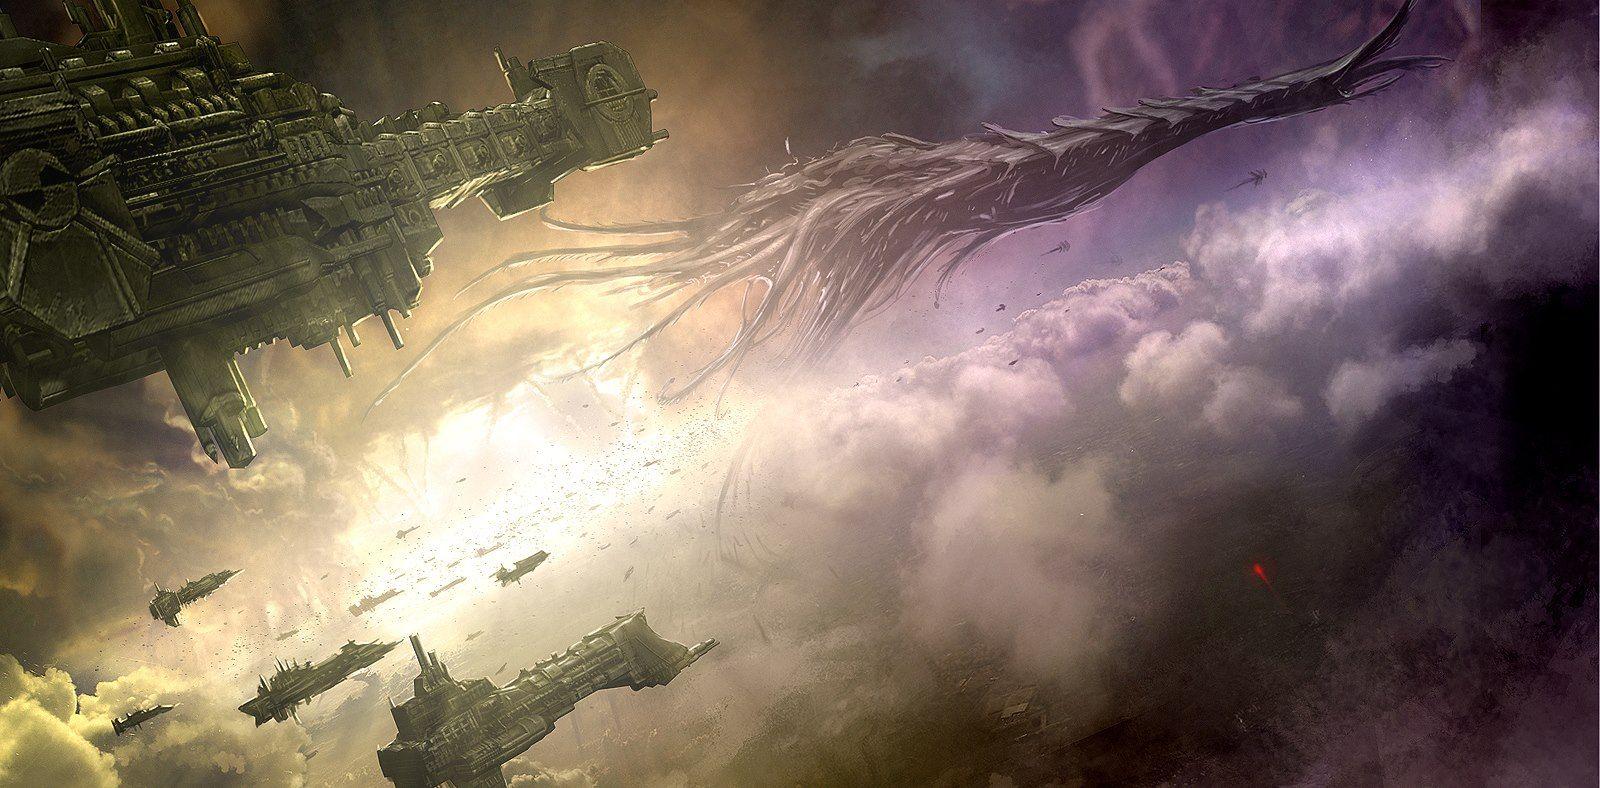 Space Marine Fleet Vs Tyranid Hive Ship |  Warhammer 40k artwork ...